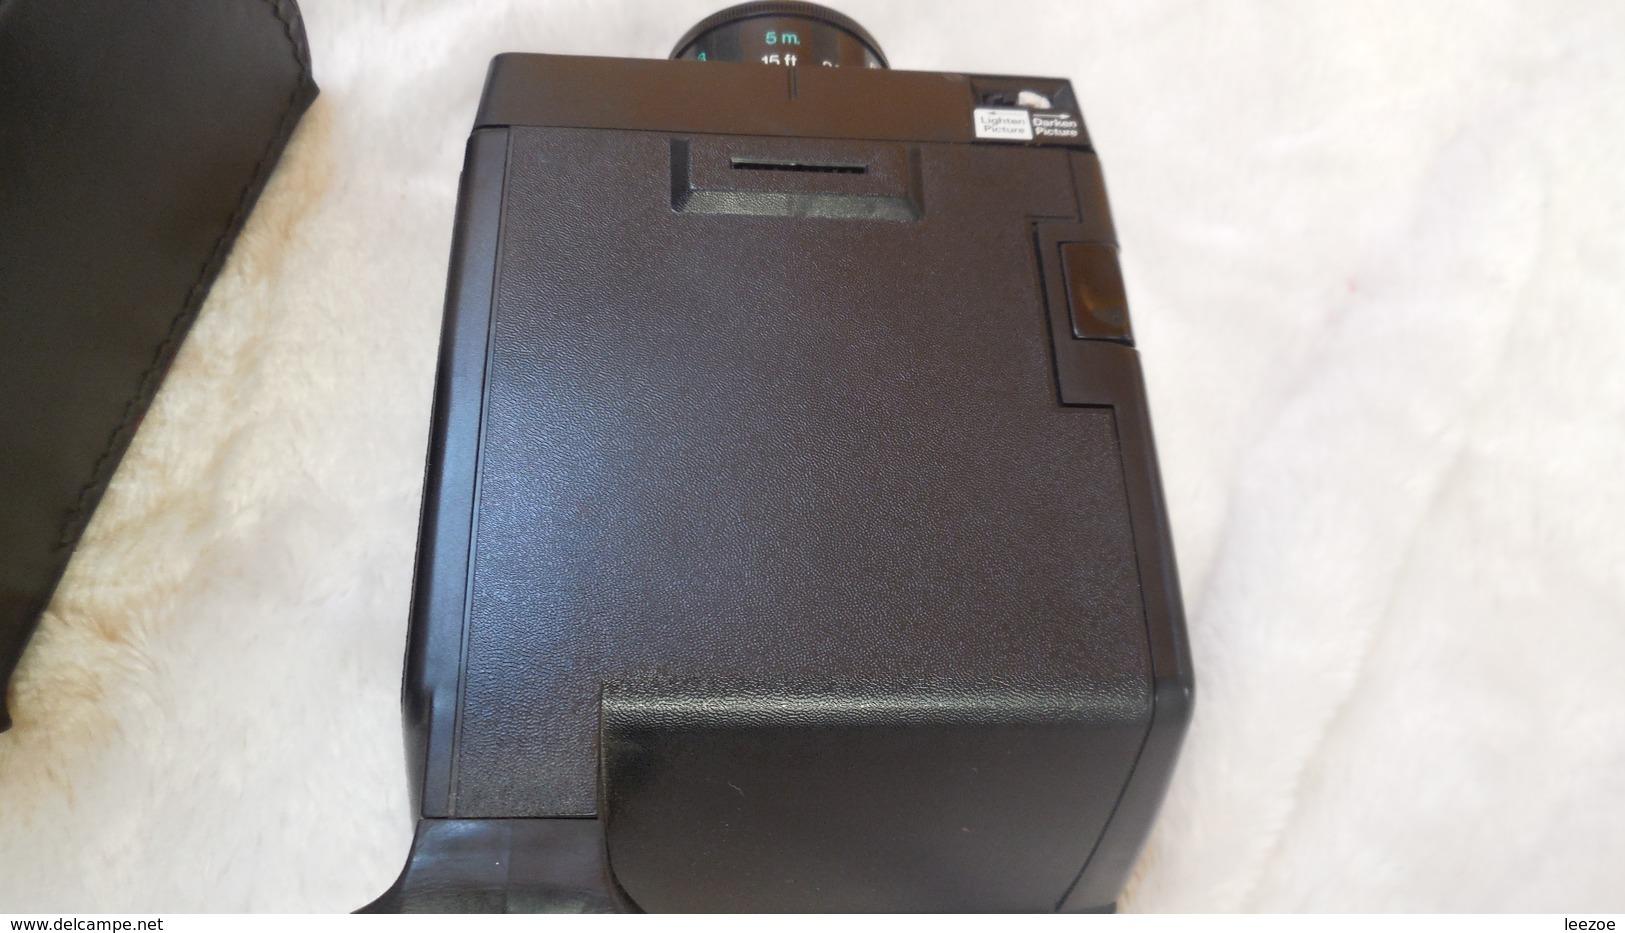 Berkey Keystone Wizard XF 1000 Utilise Des Films Polaroid SX-70...115mm F/8.8 MADE IN U.S.A - Appareils Photo